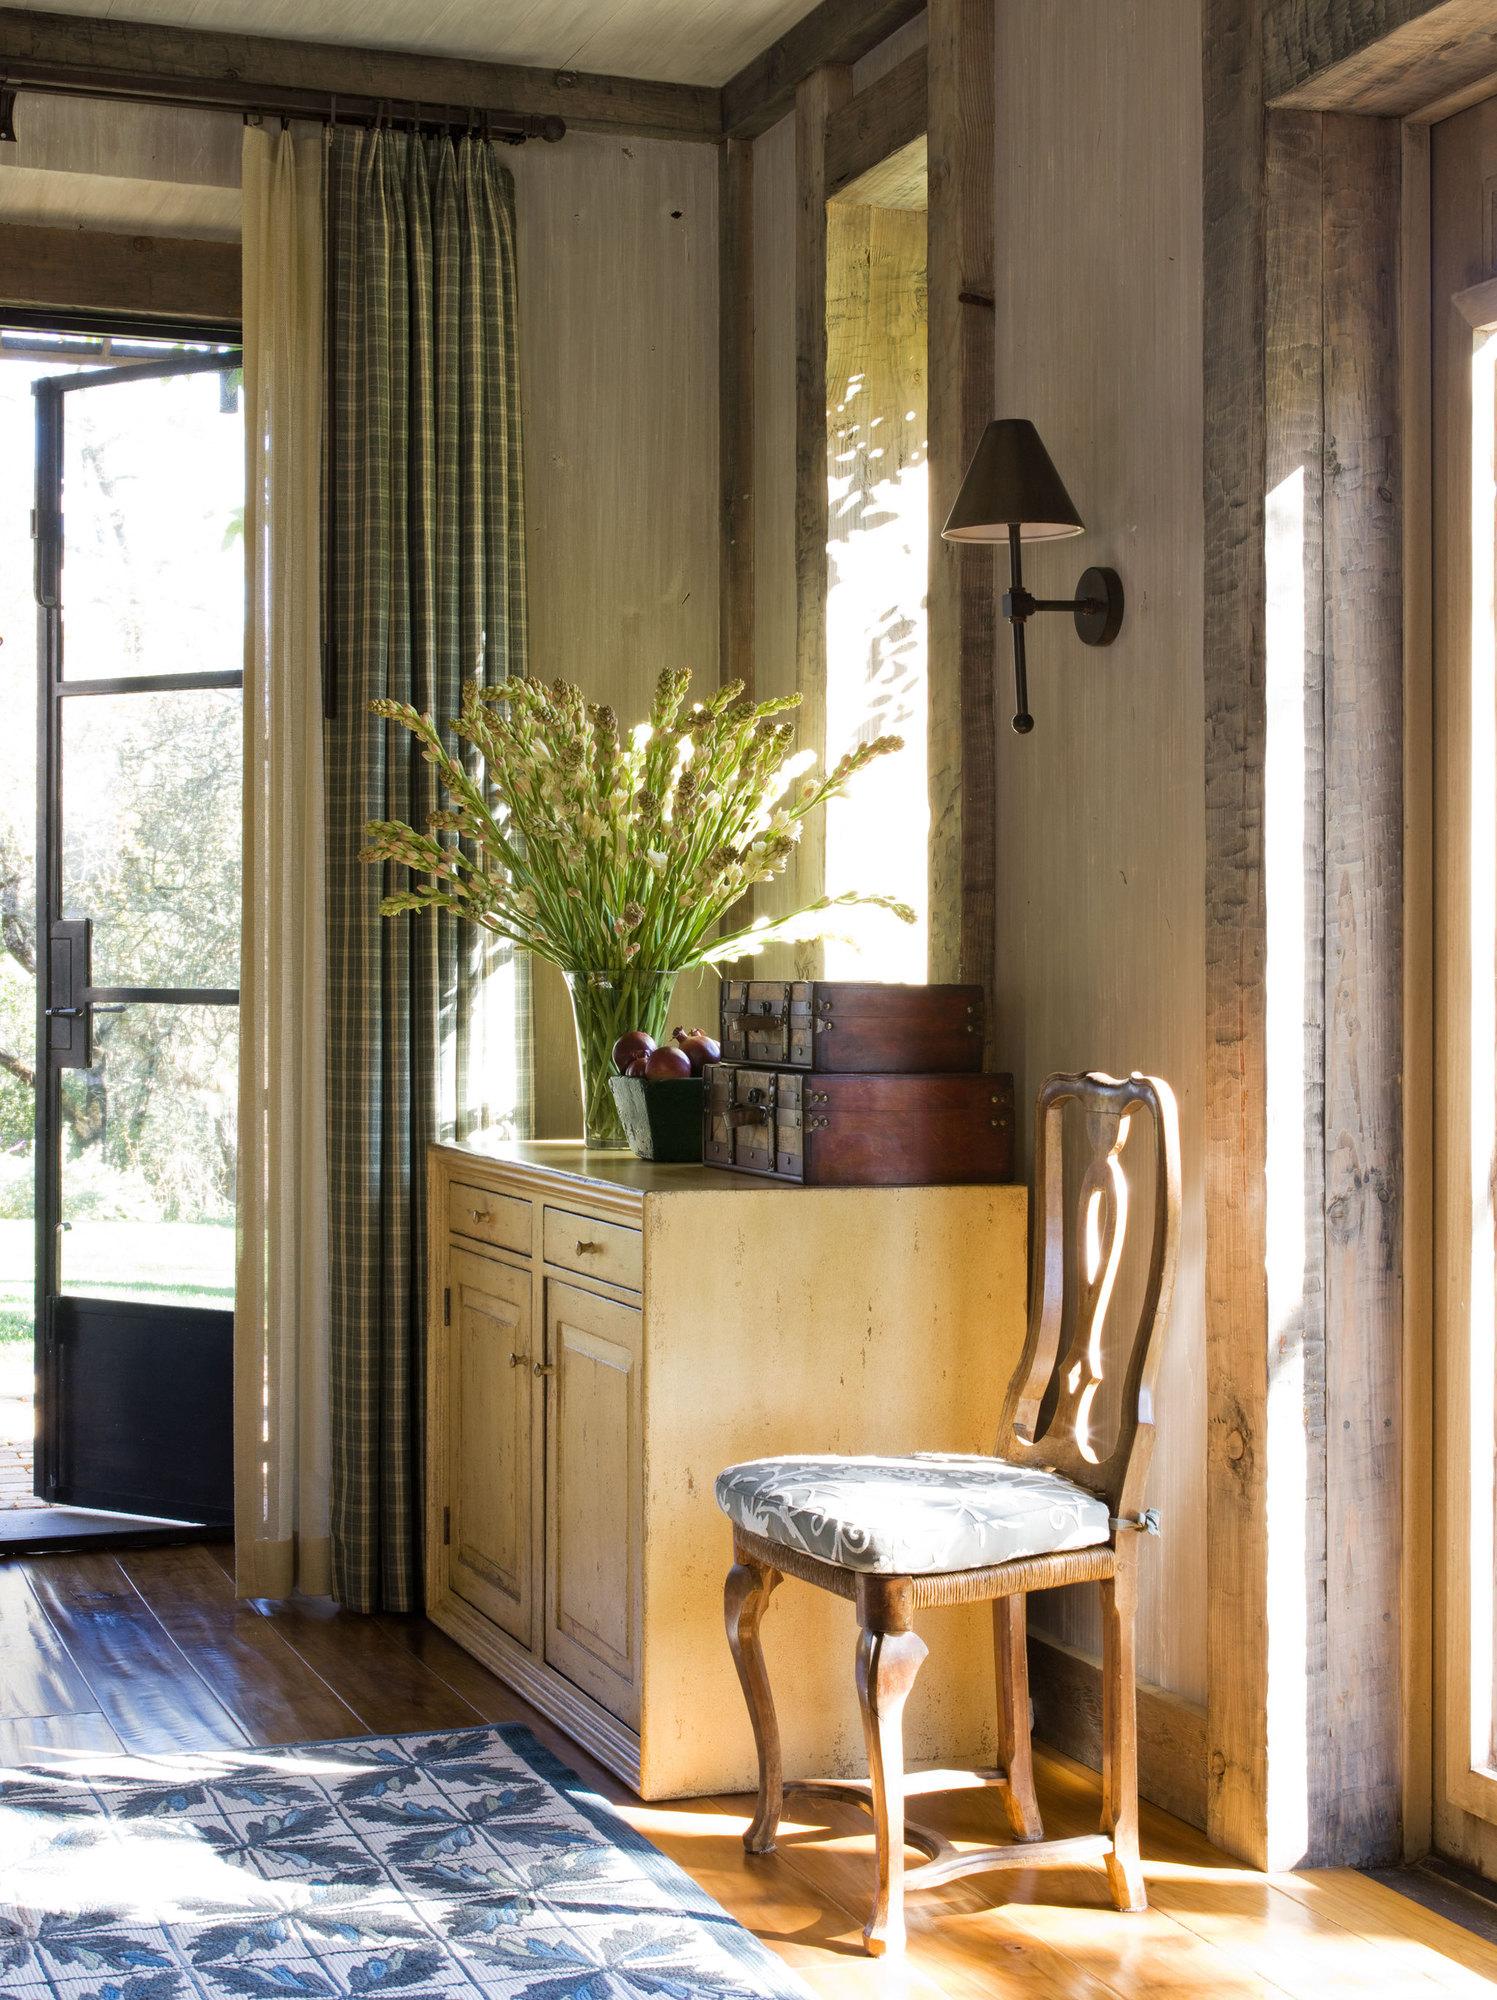 Napa Valley, California home interior